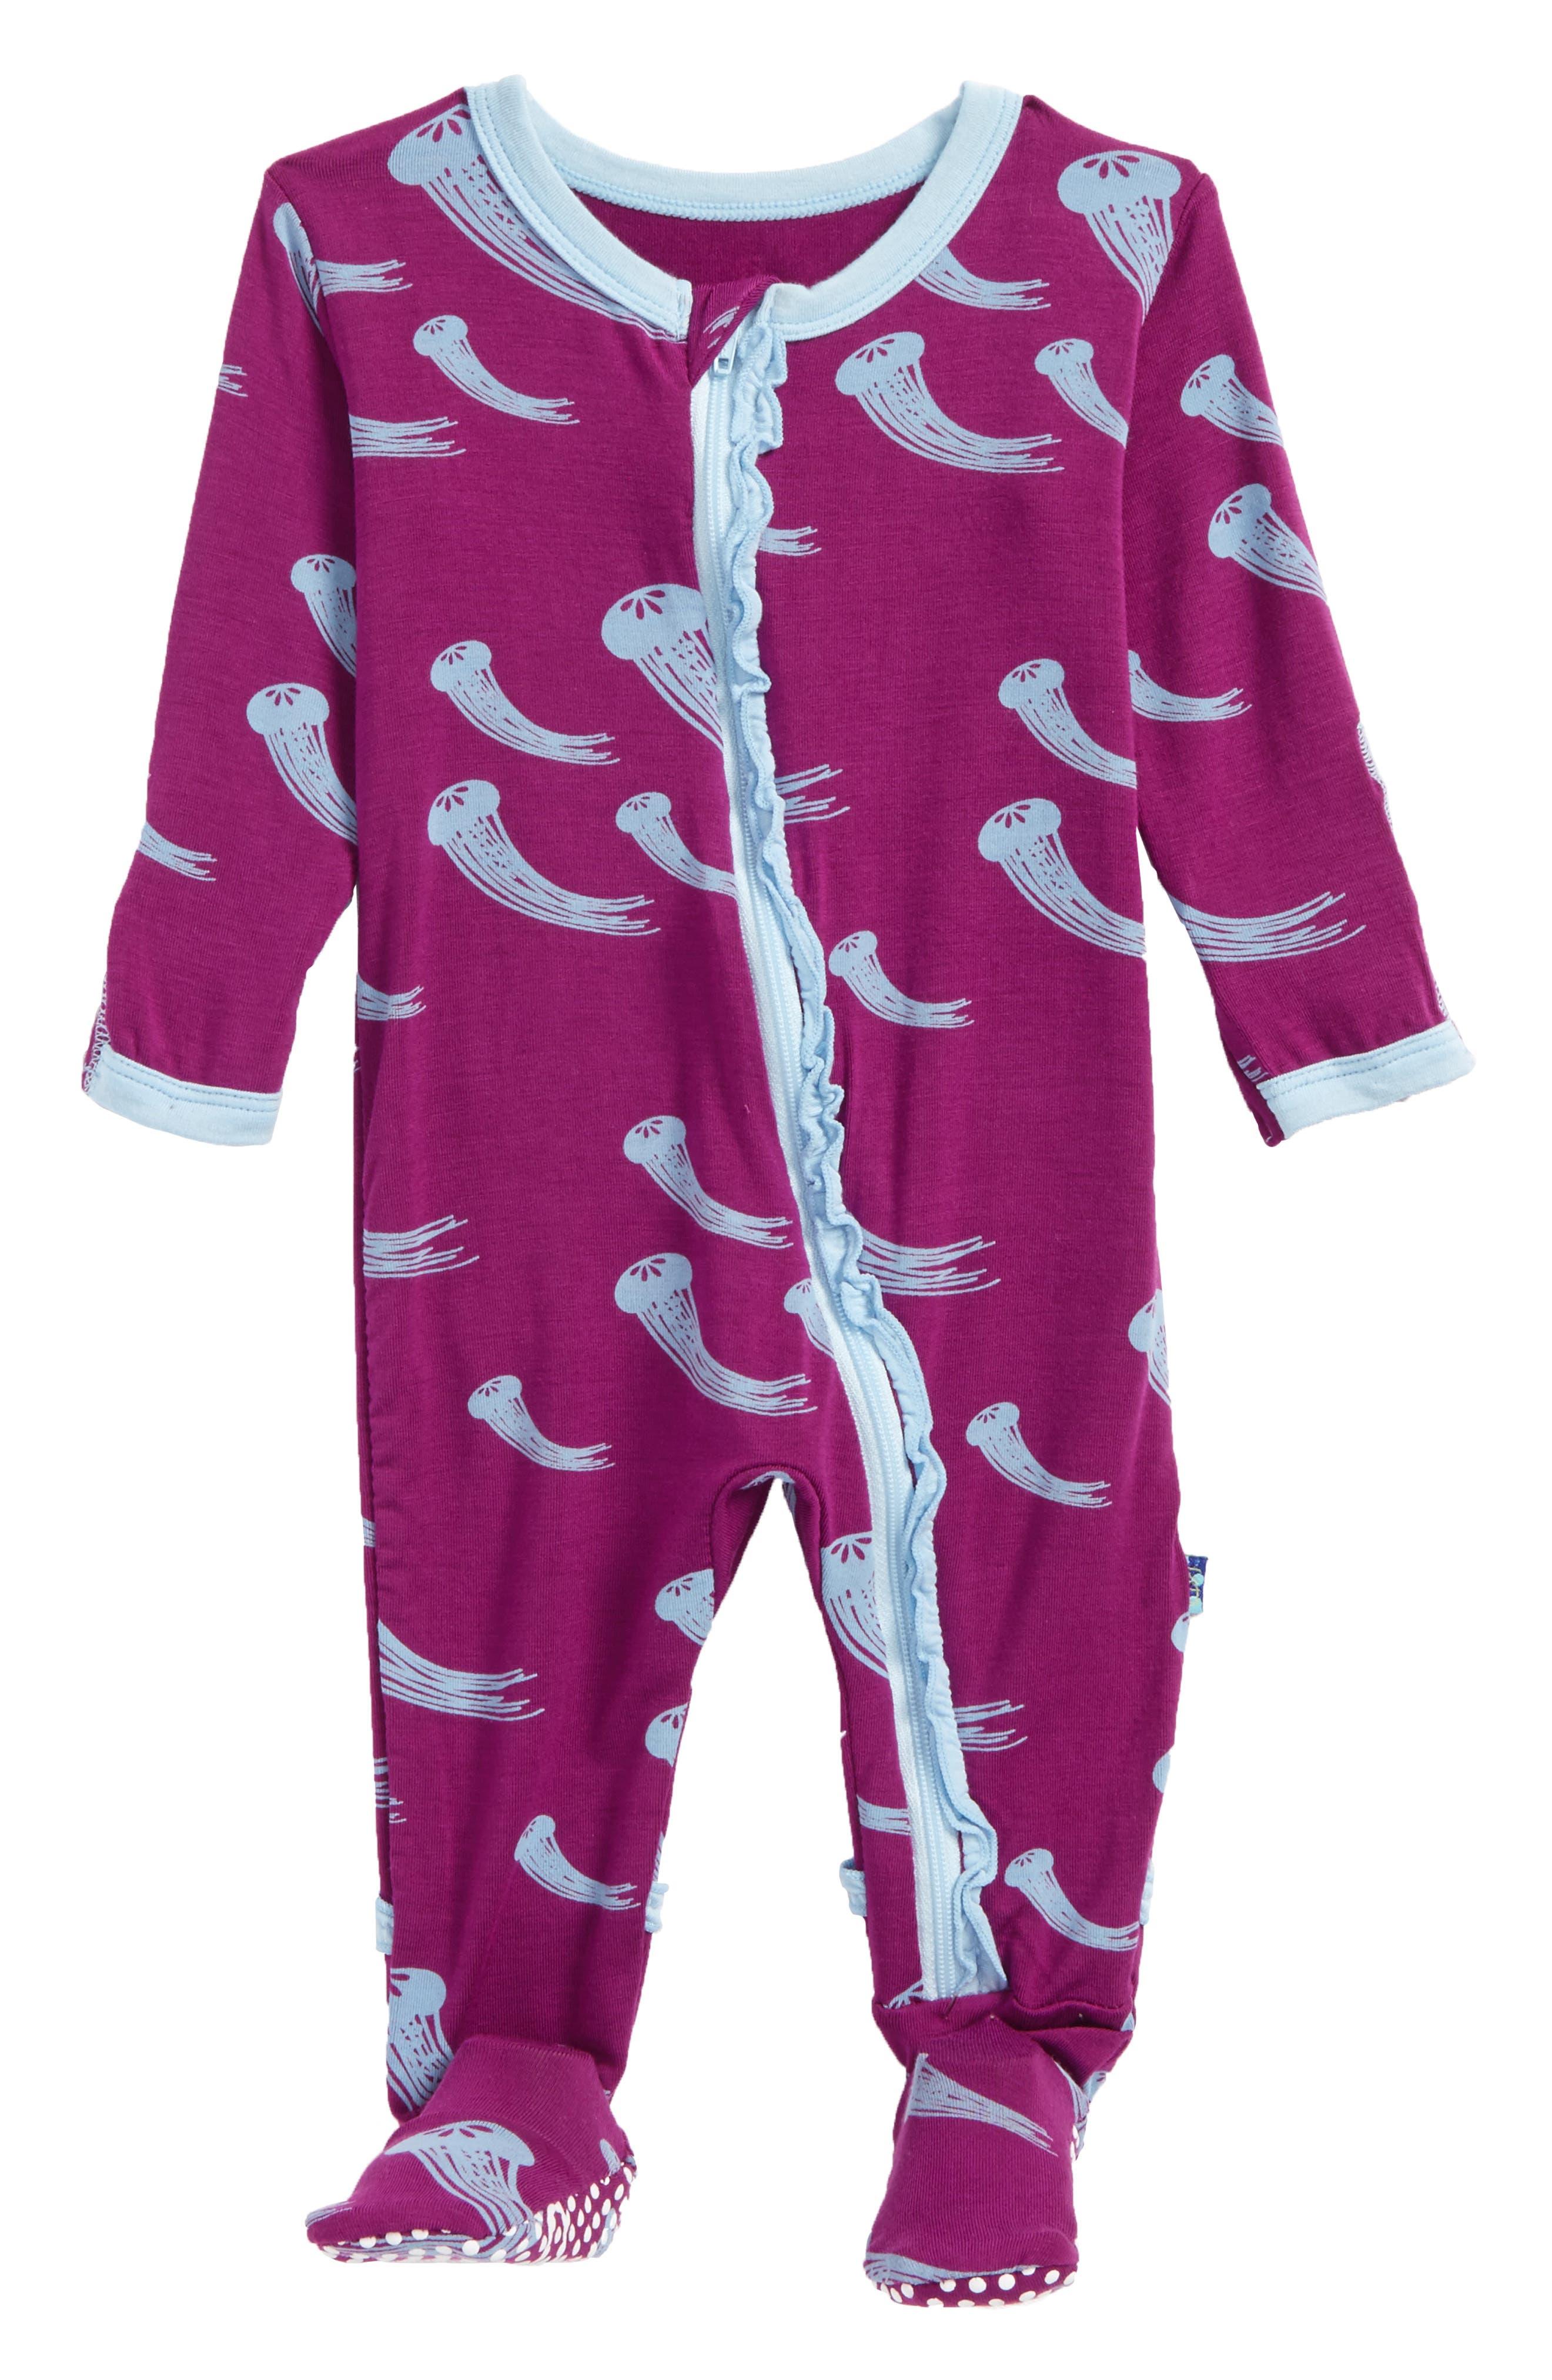 Main Image - Kickee Pants Print Ruffle Footie (Baby Girls)